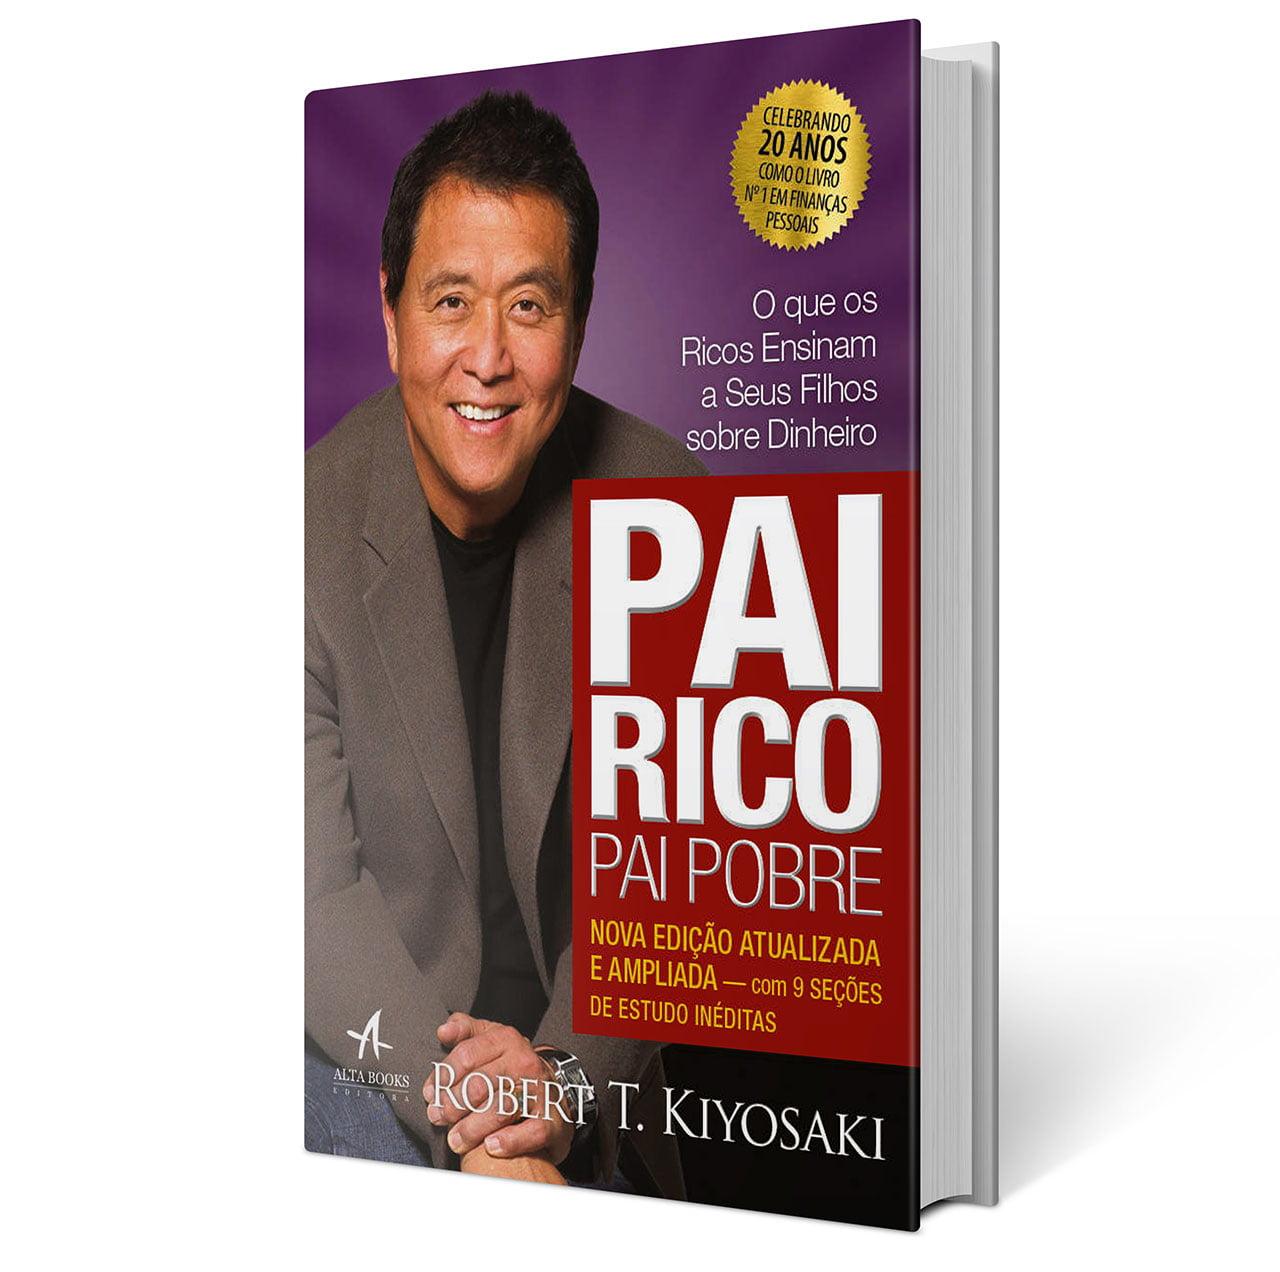 Livro: Pai Rico Pai Pobre - Robert T Kiyosaki